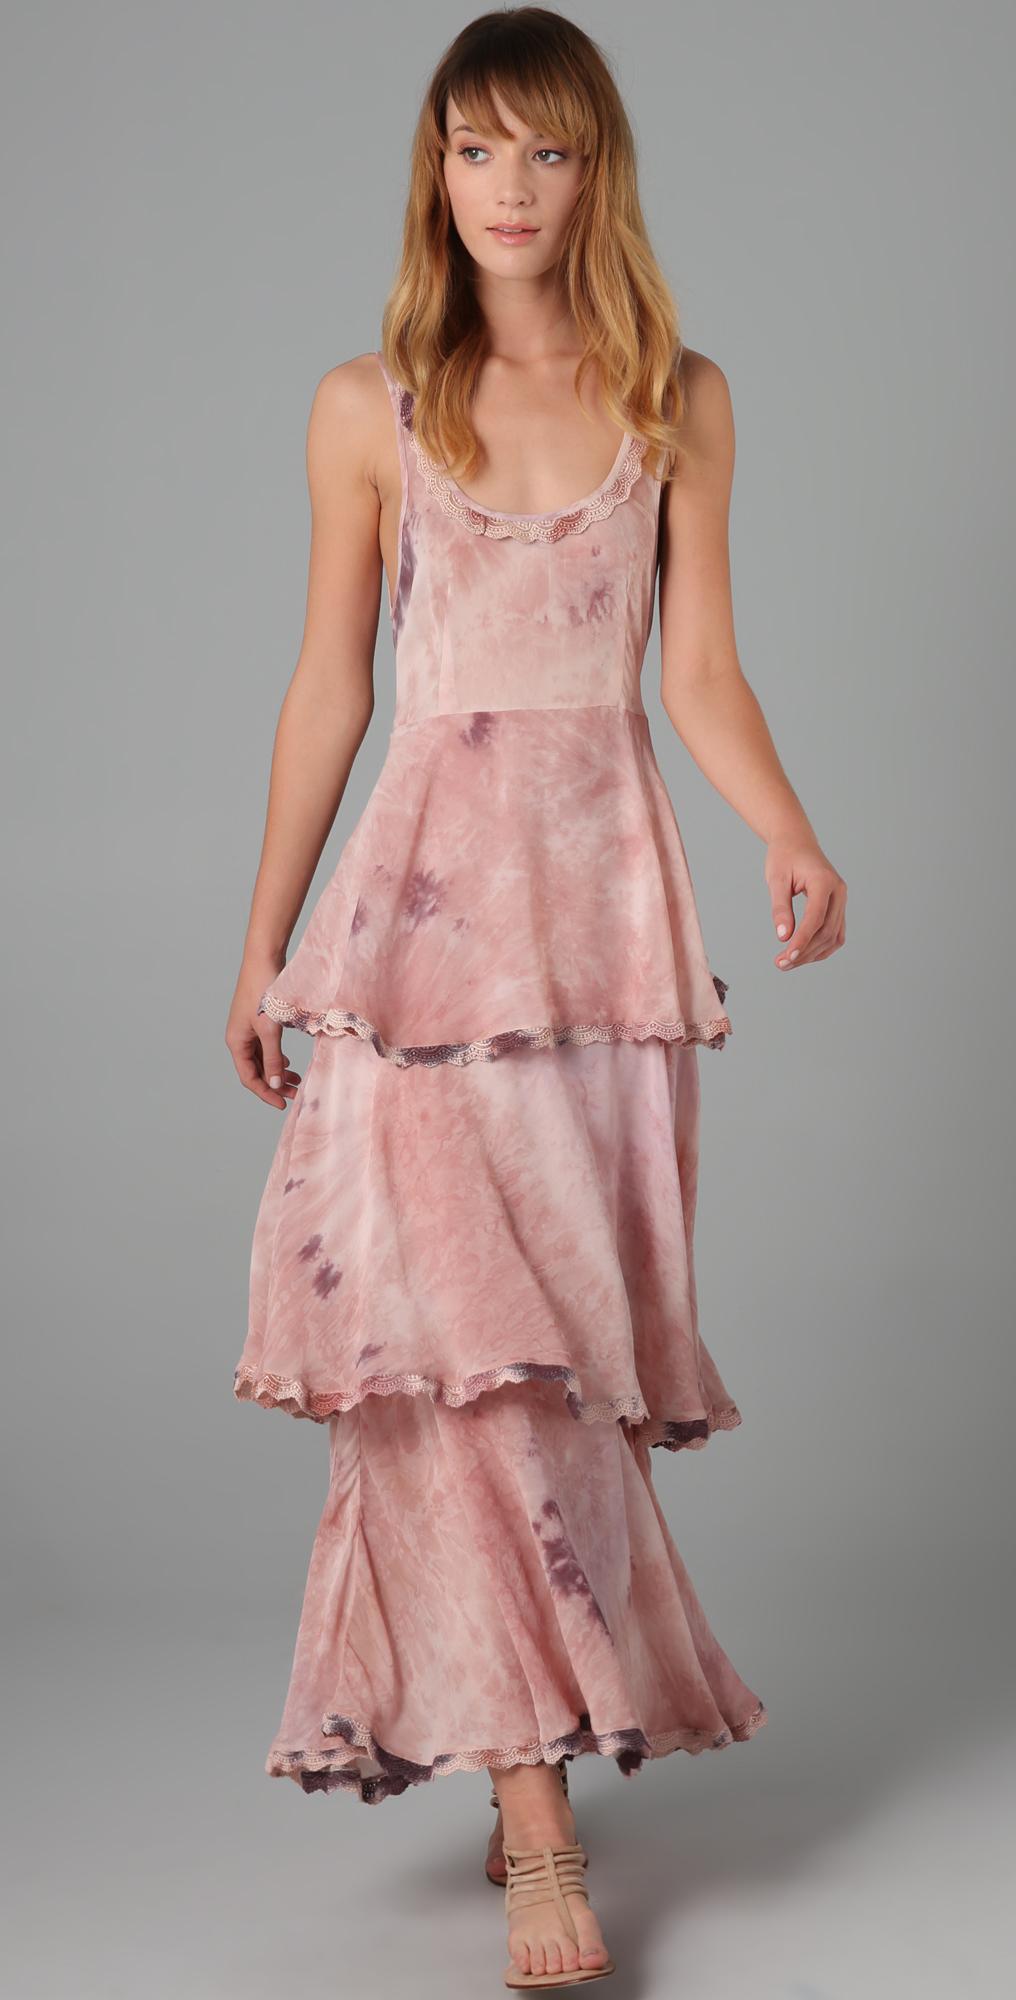 Free People New Romantics Tiered Dress | SHOPBOP